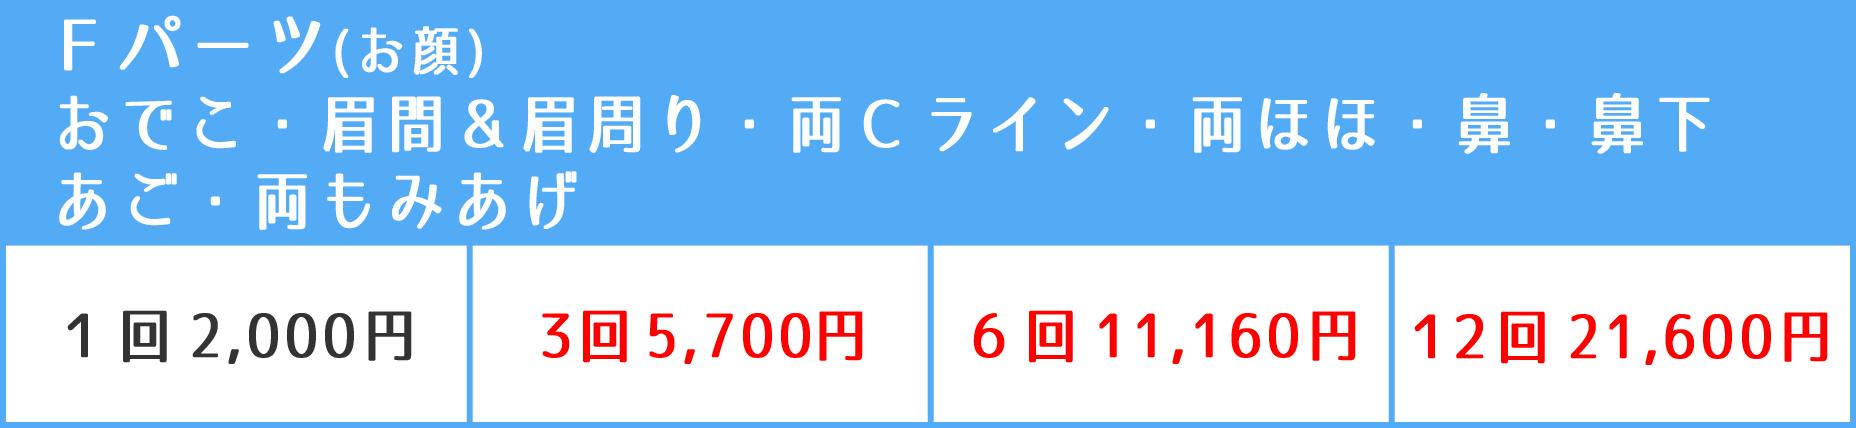 F(お顔)パーツ料金表